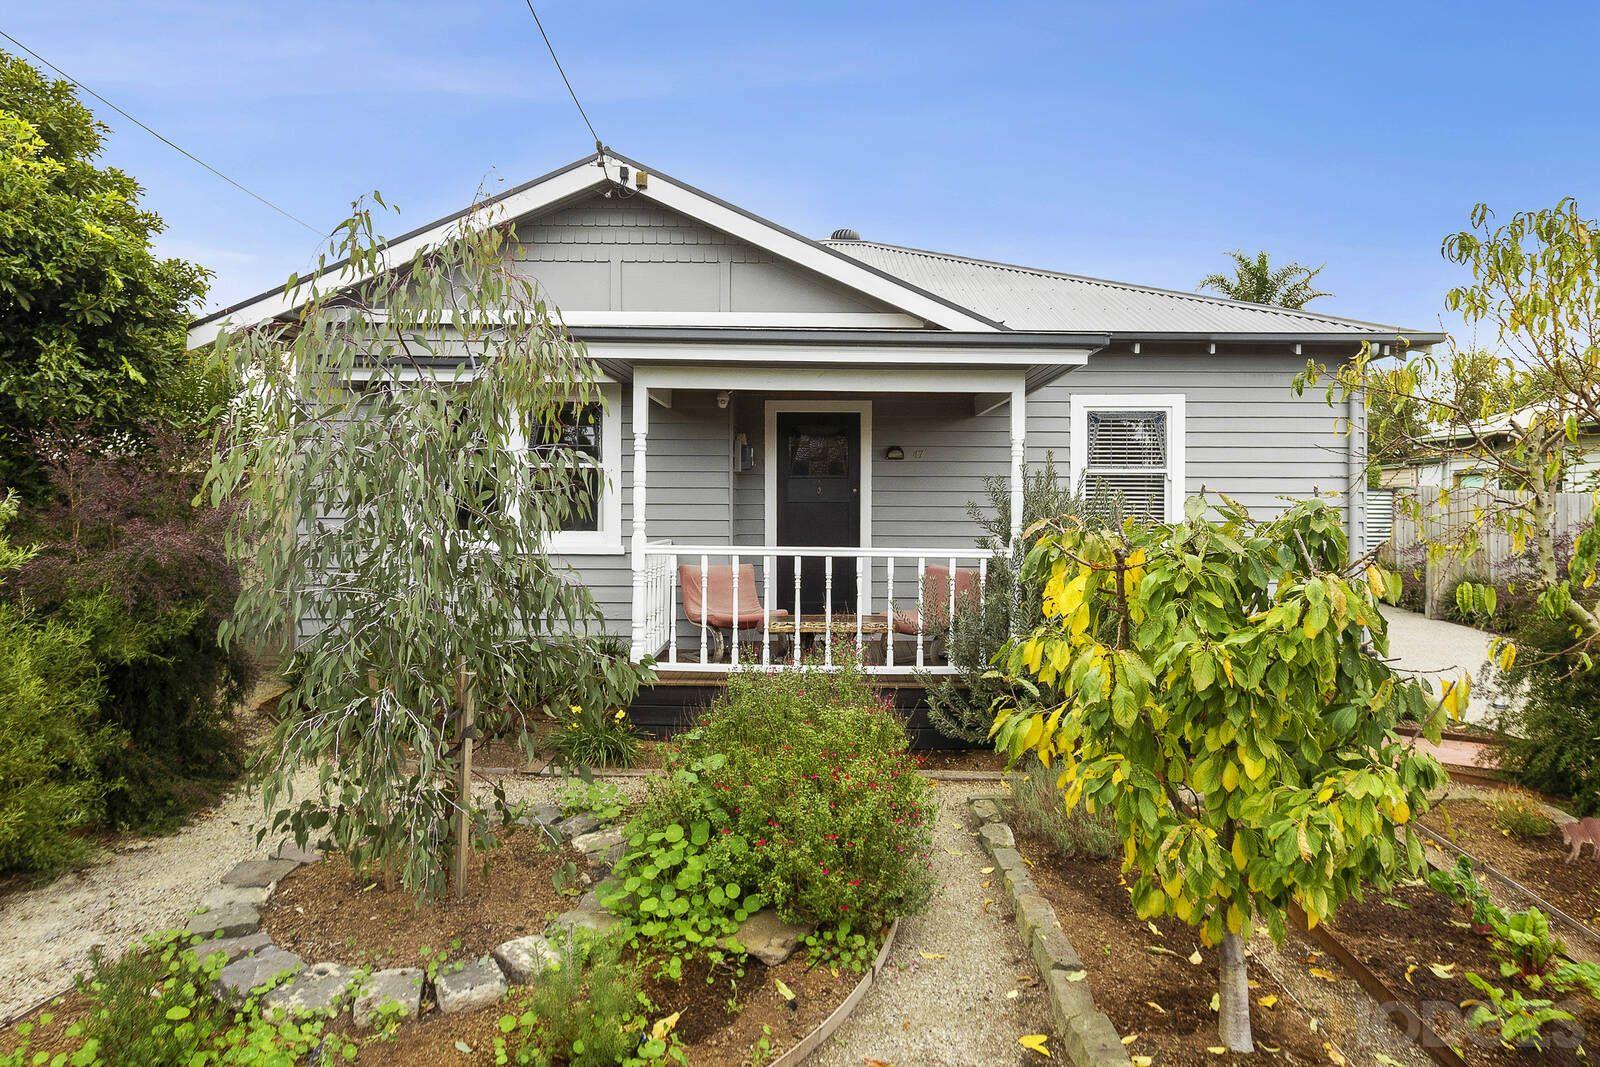 47 Stubbs Avenue, North Geelong VIC 3215, Image 0